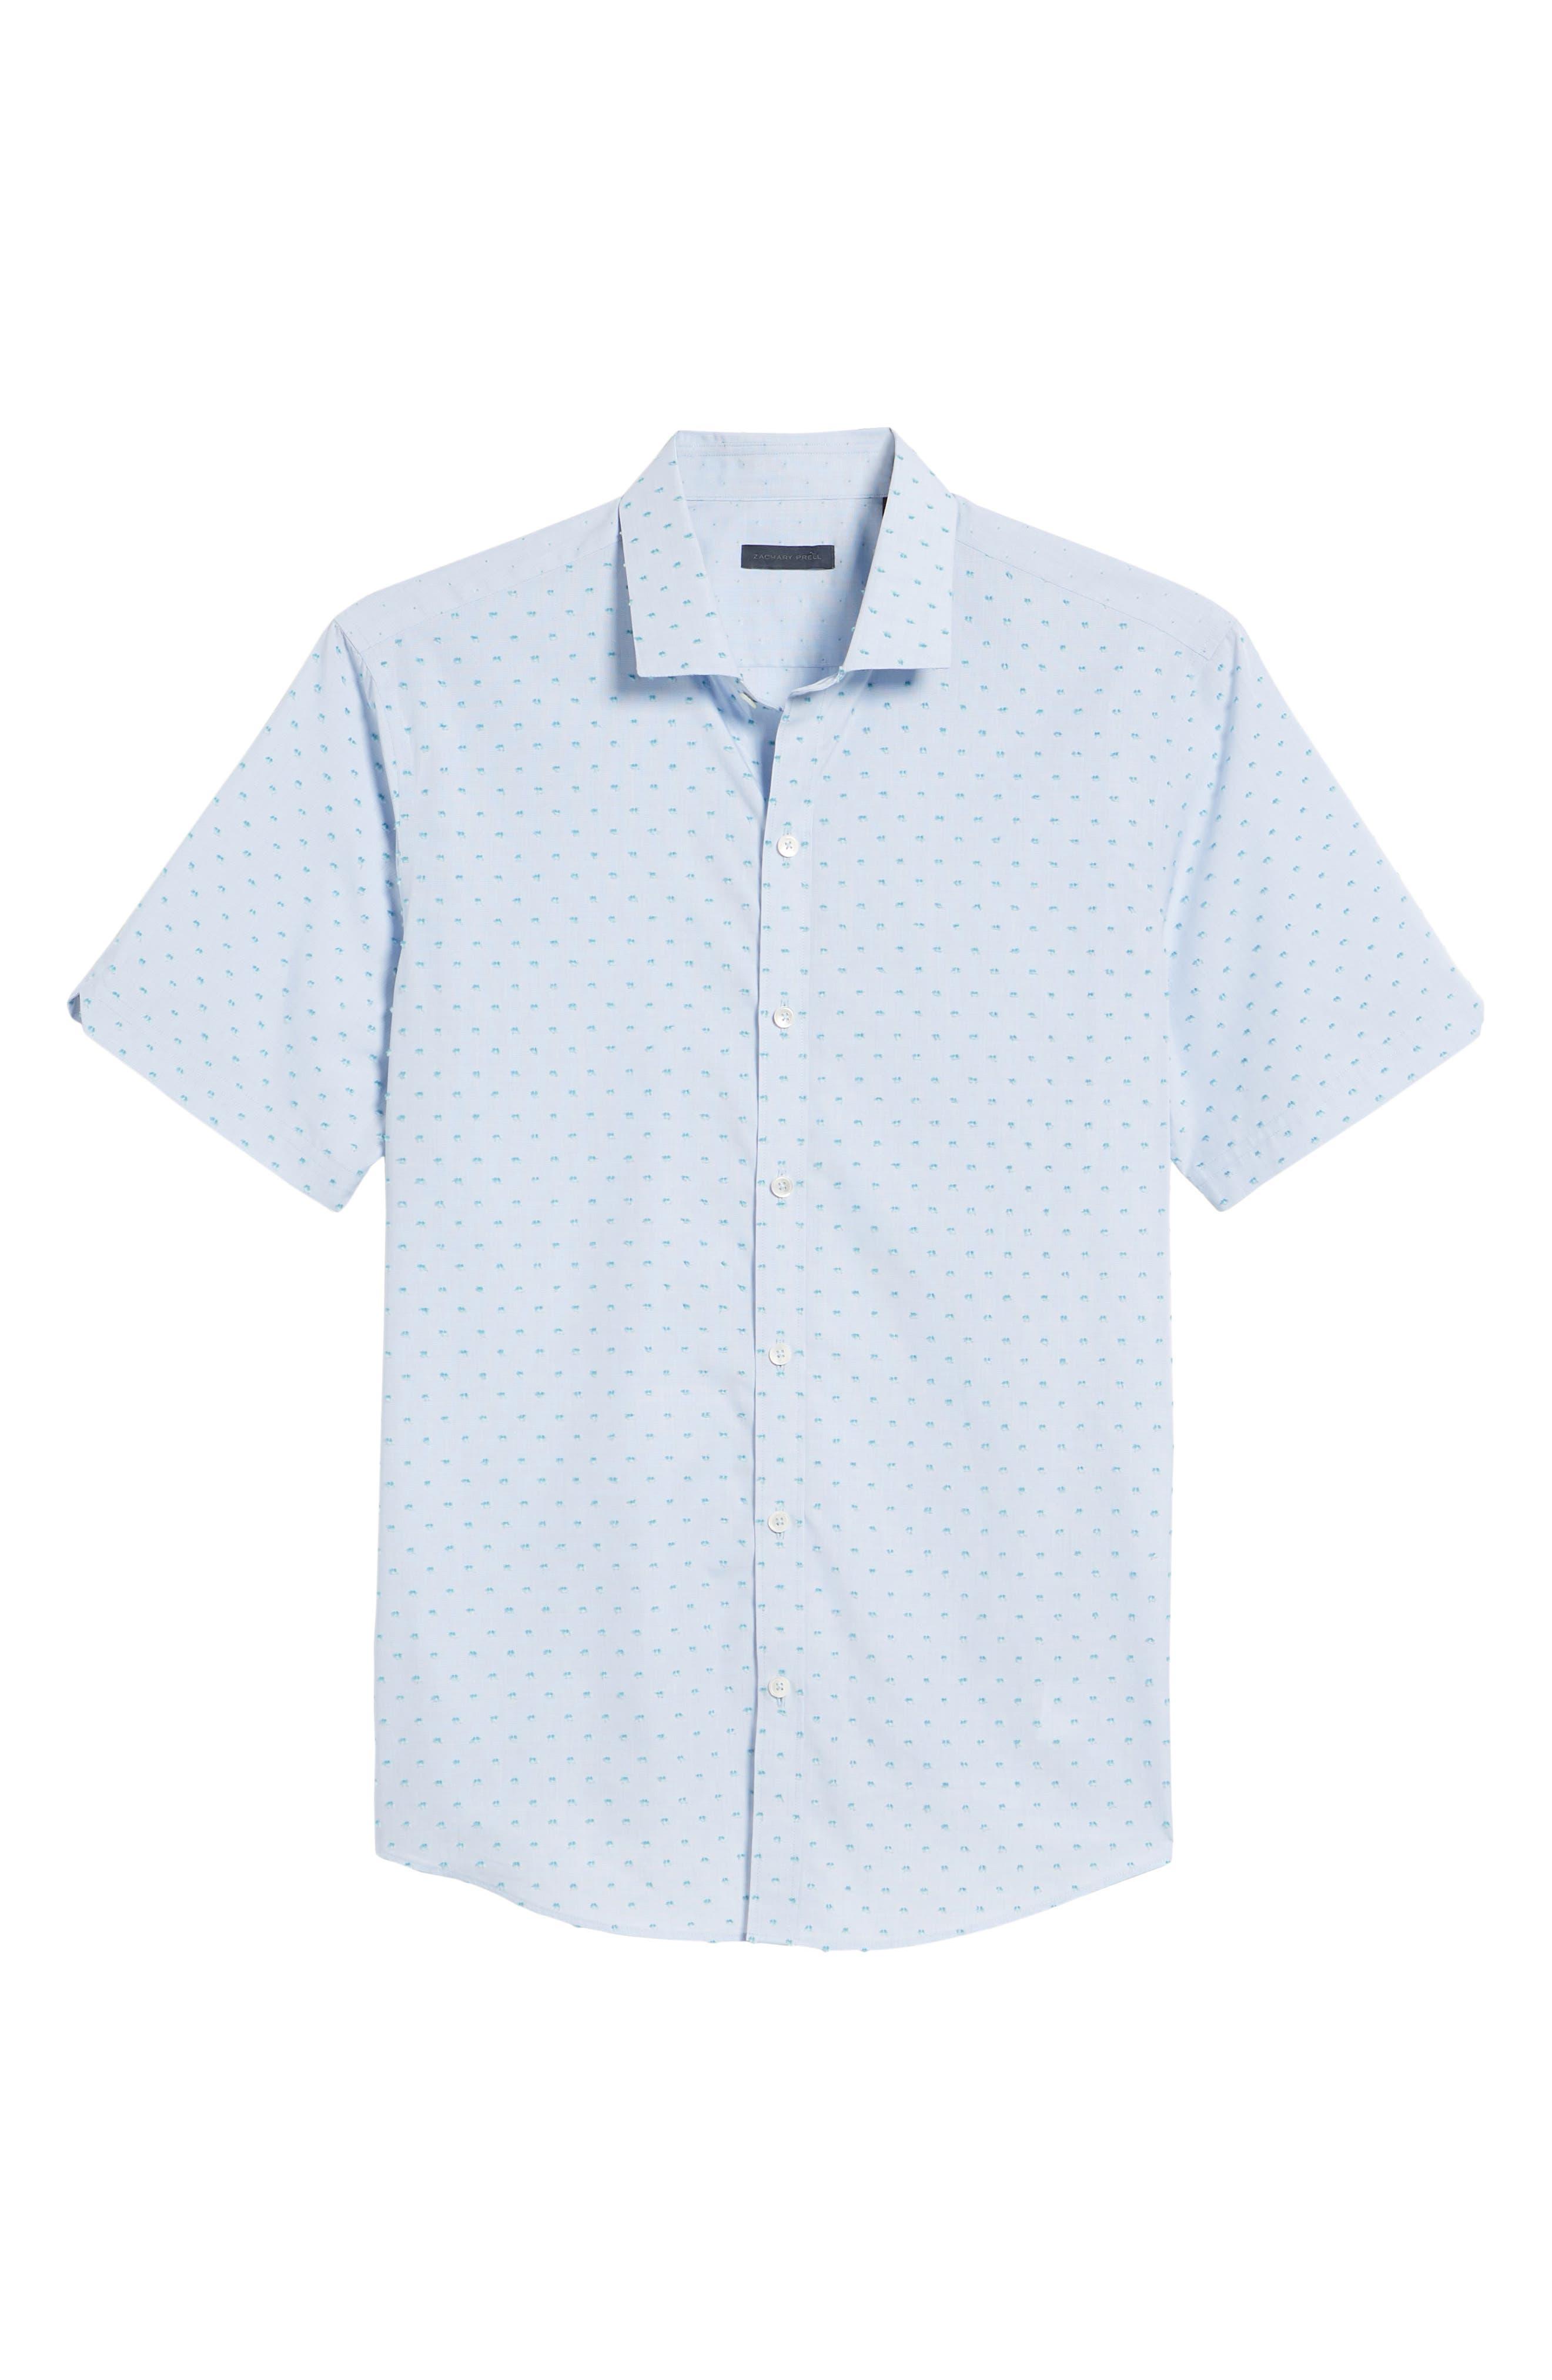 Dolle Fil a Coupe Sport Shirt,                             Alternate thumbnail 6, color,                             450